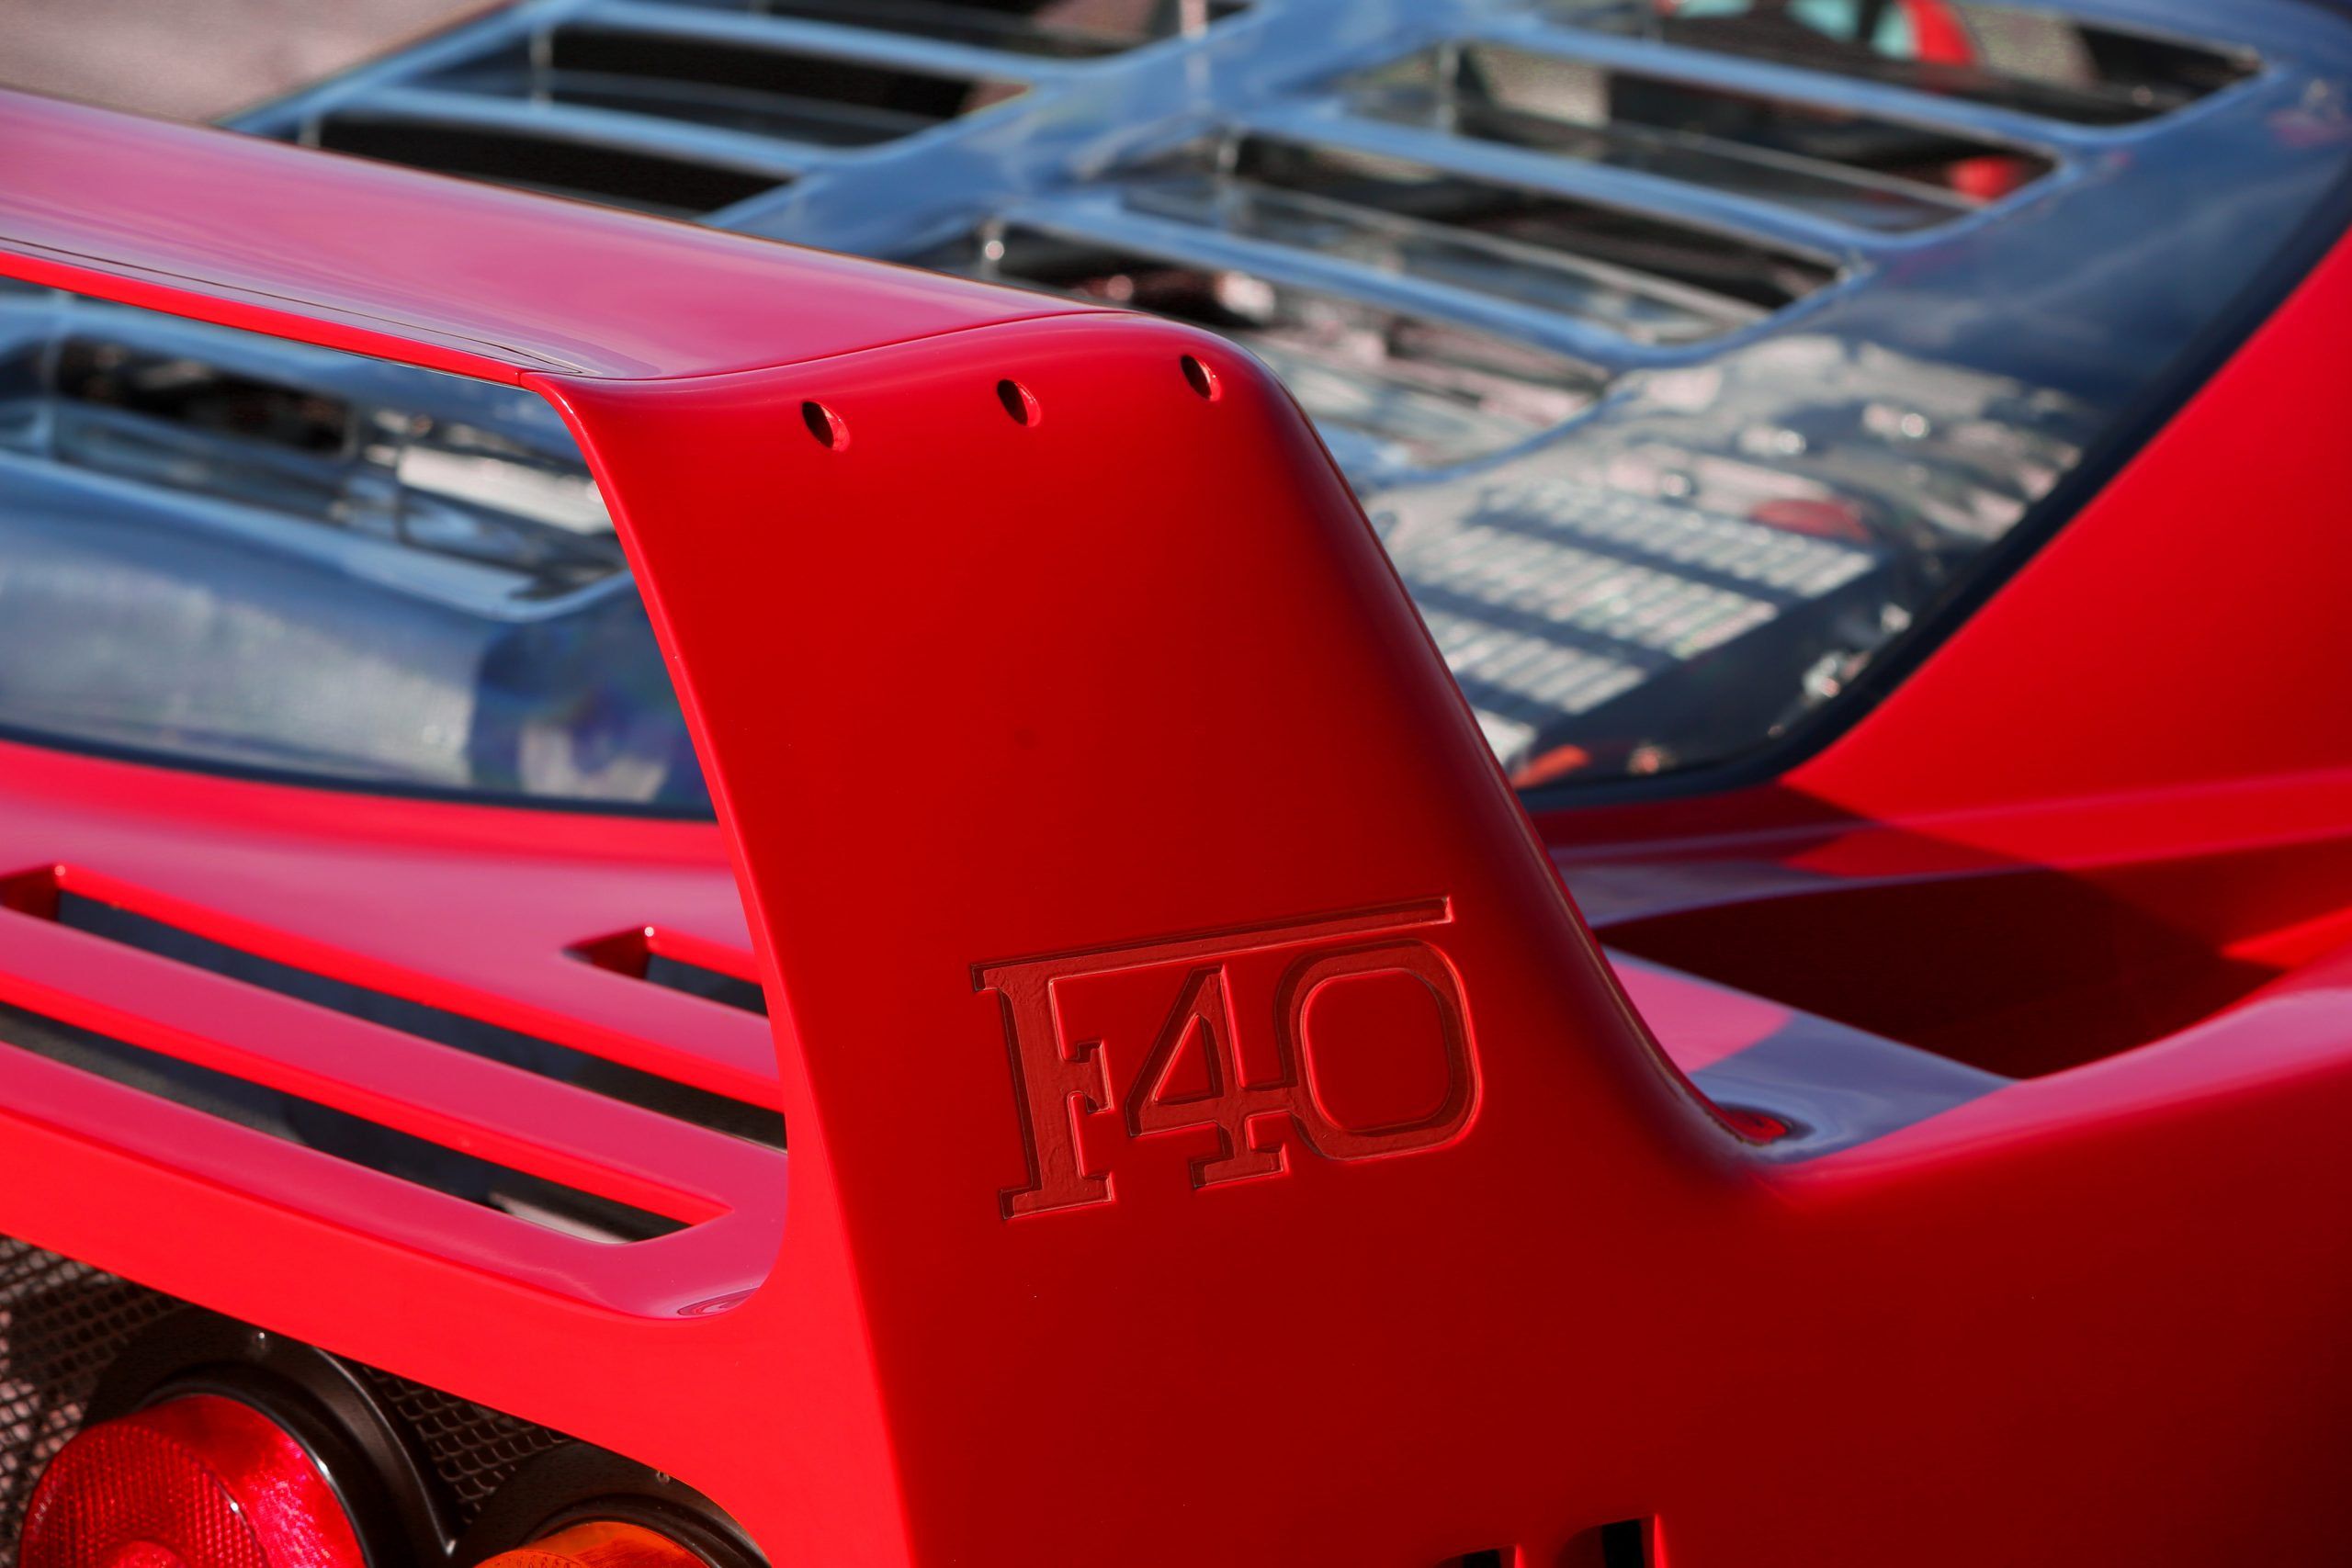 1991 Ferrari F40 rear wing signature